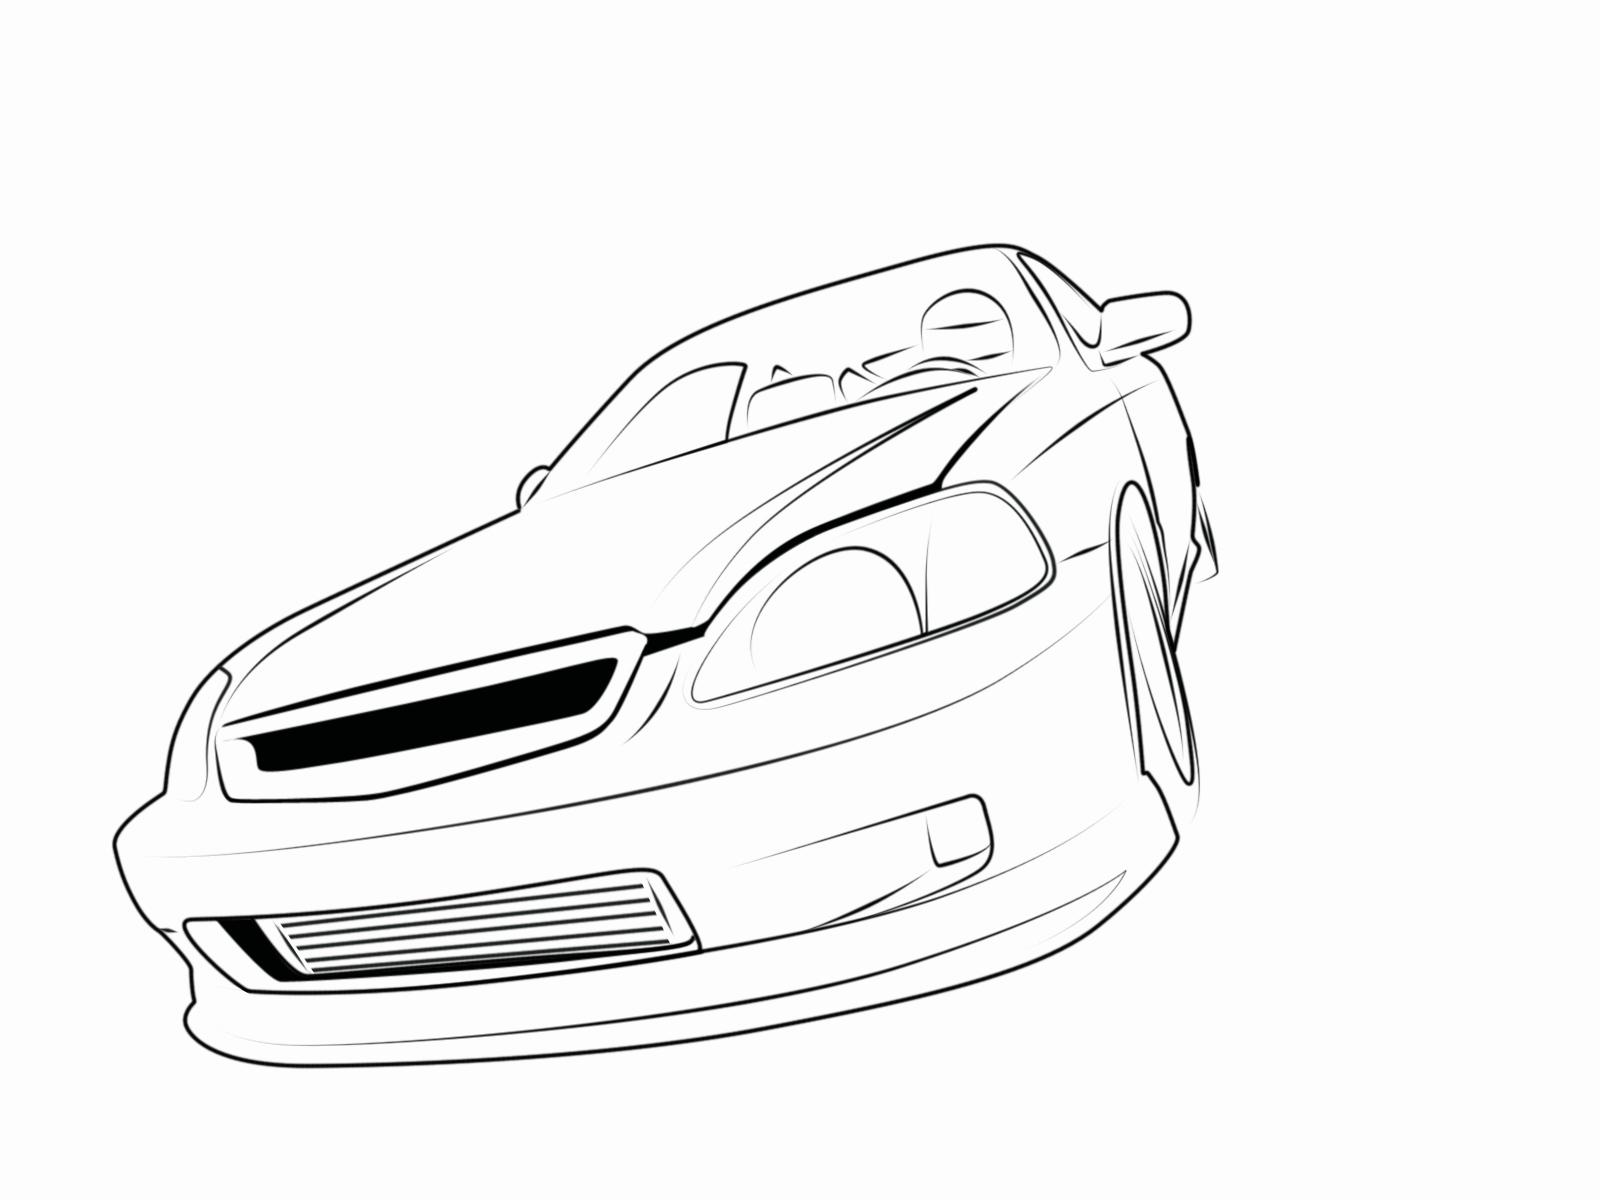 10 Mewarnai Gambar Mobil Sedan